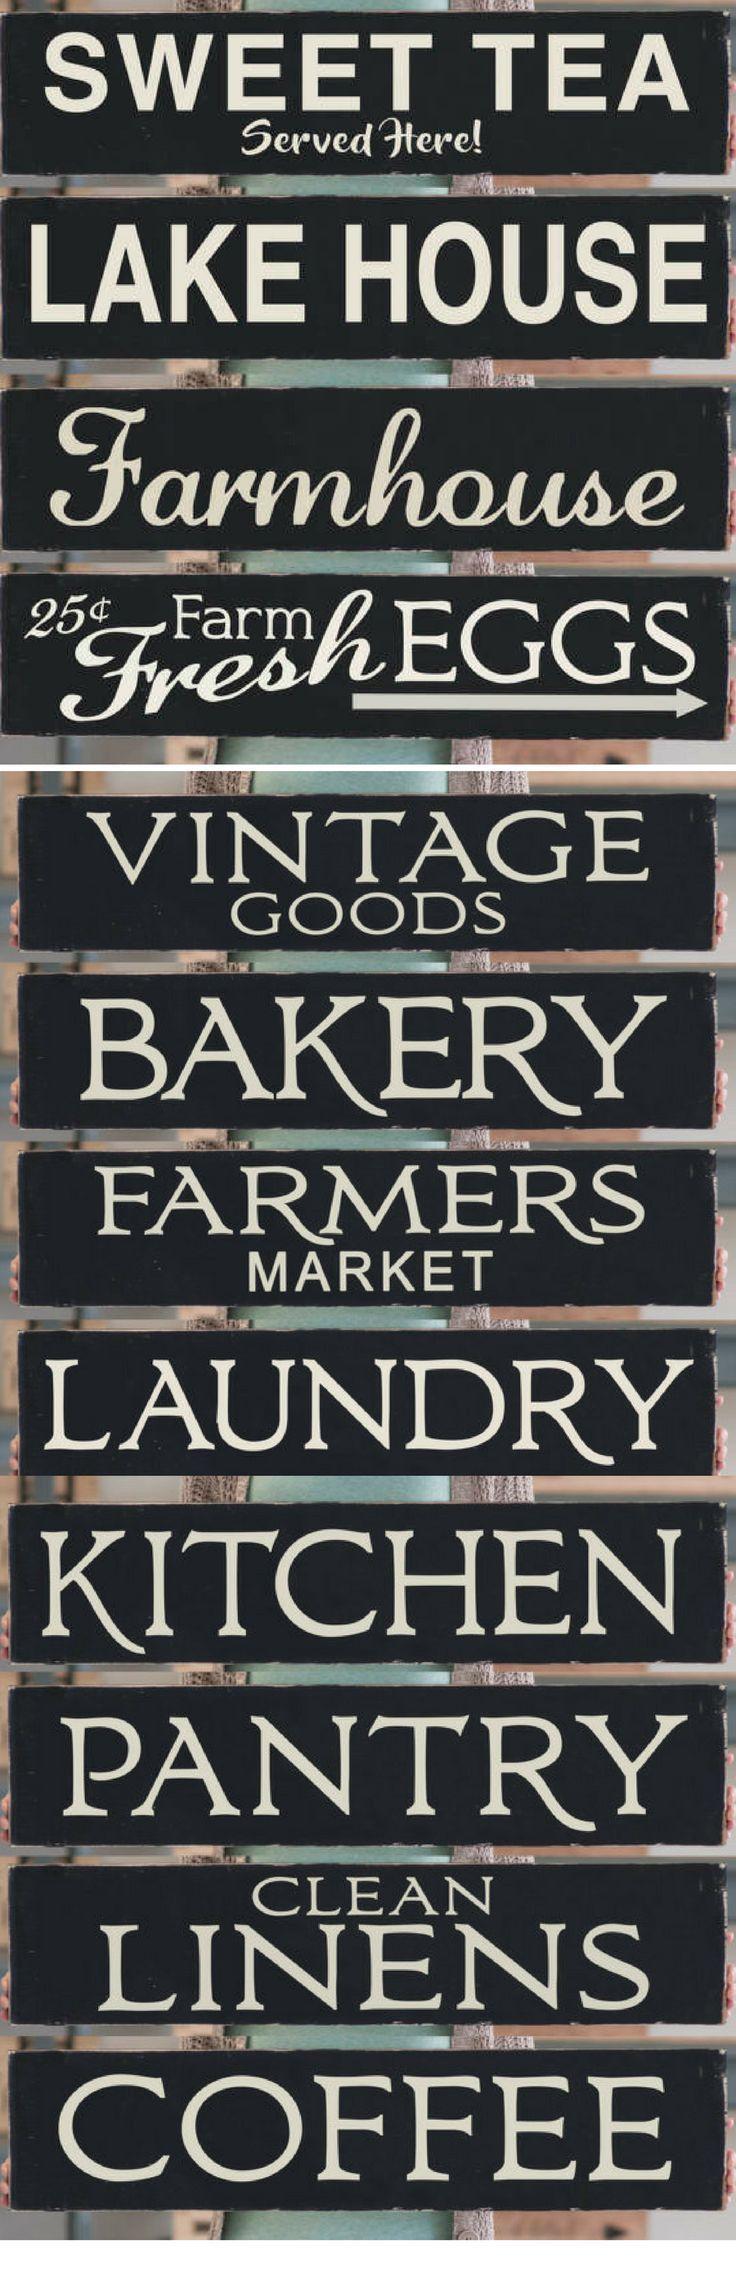 Market Fresh Produce Rustic Home Decor Wood Sign | Kitchen Signs | Farm Fresh Bakery Sign | Farmhouse Style Sign | Mom Gift | Matte Black #kitchen #farmhousesign #lakehouse #summer #rusticsign #sign #diy #farmhousesign #rusticdecor #diy #affiliate